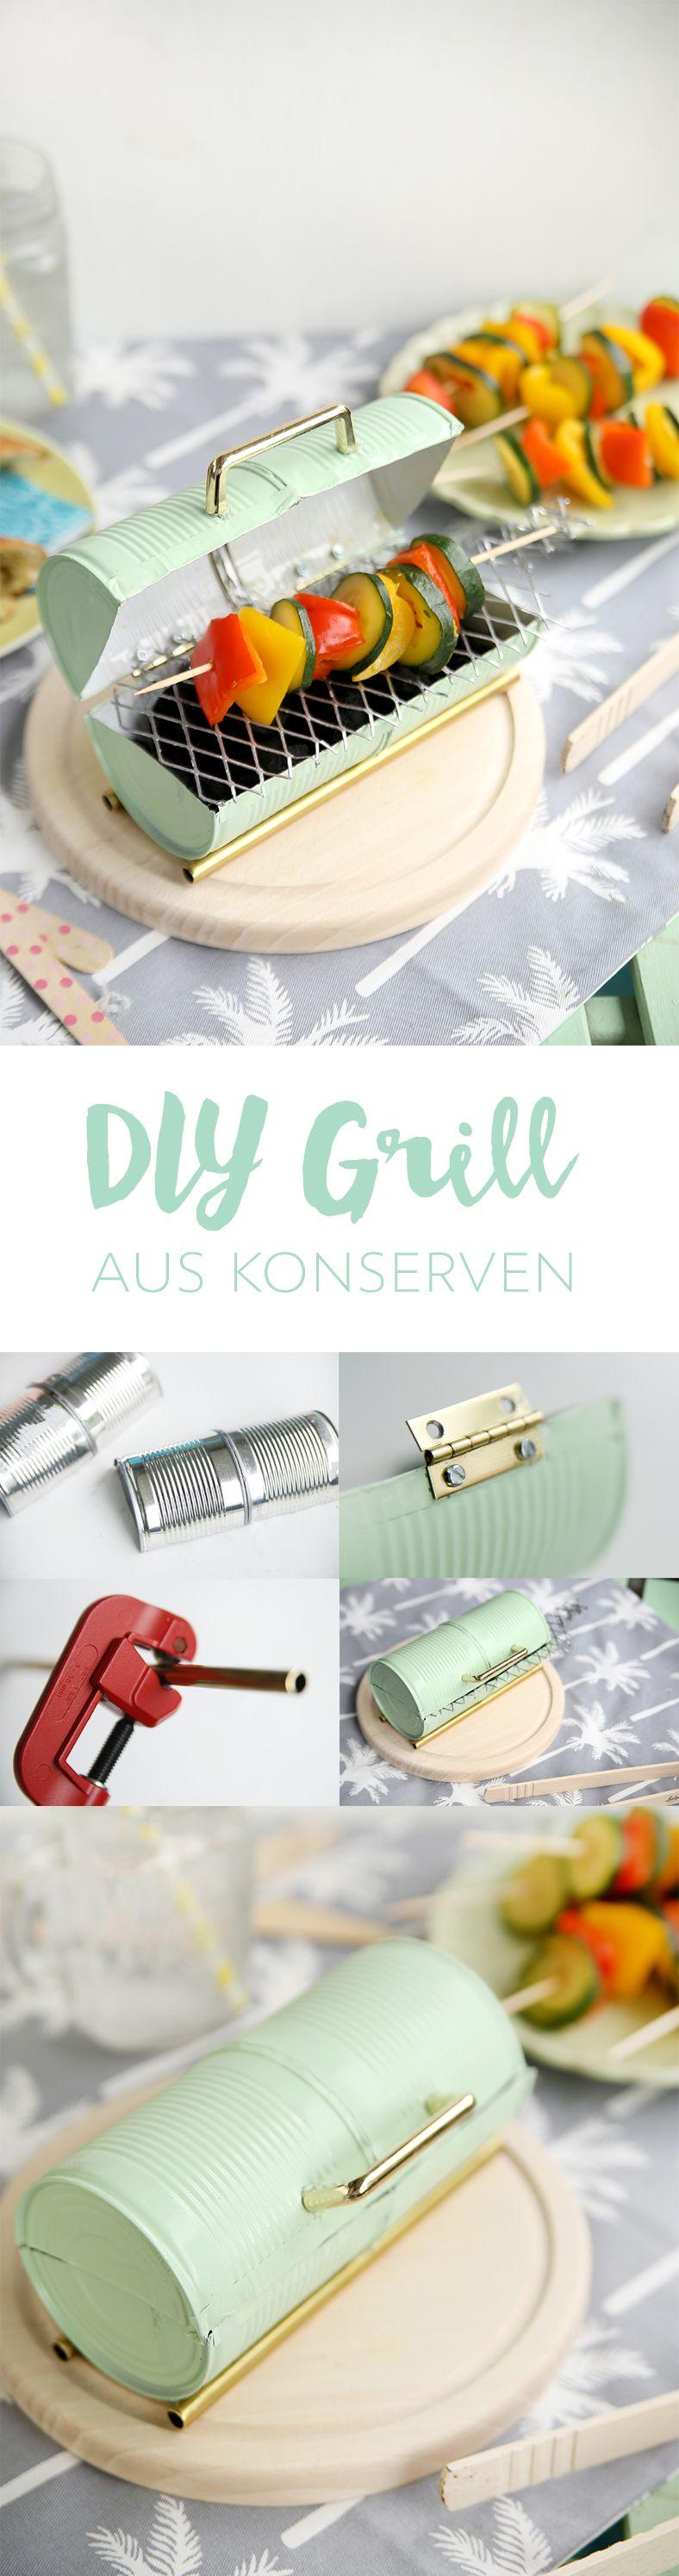 diy mini grill aus konserven selbstgemacht konservendosen grill und upcycling. Black Bedroom Furniture Sets. Home Design Ideas